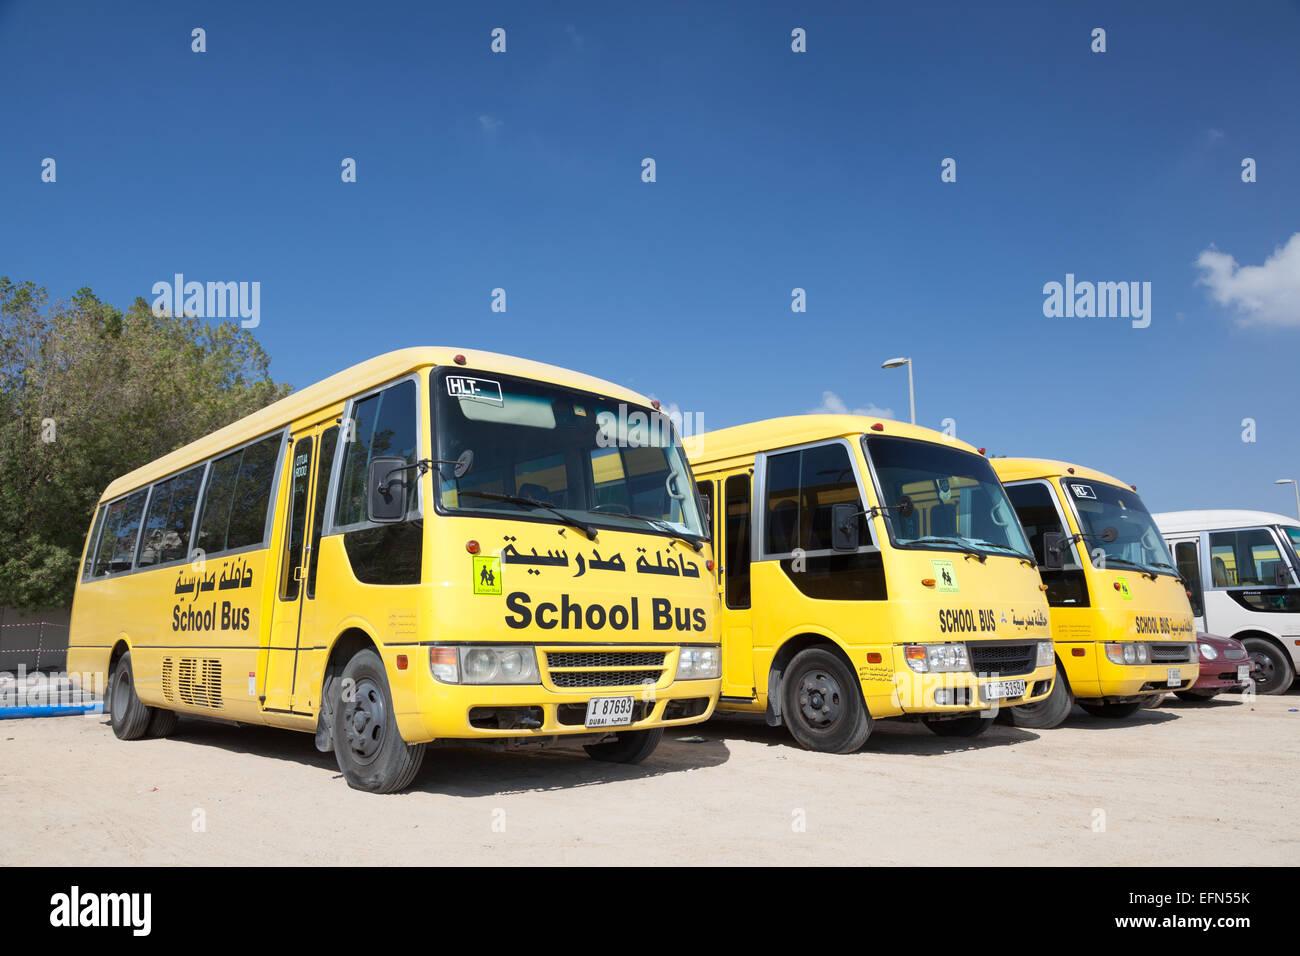 Yellow School Buses in the parking lot in Dubai. December 18, 2014 in Dubai, United Arab Emirates Stock Photo